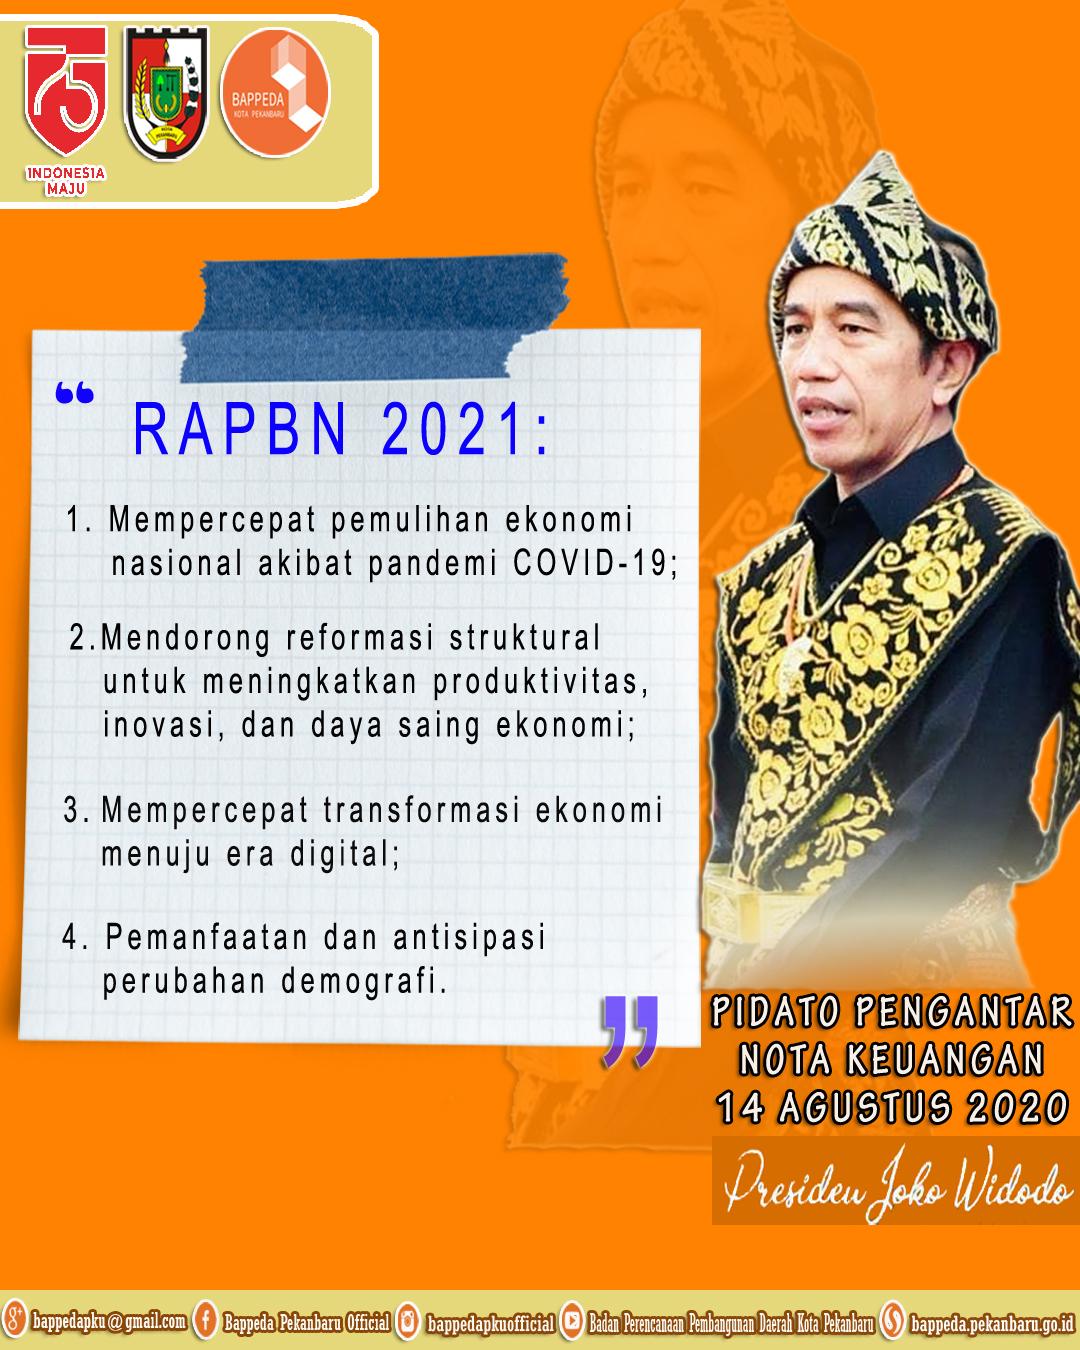 RAPBN 2021